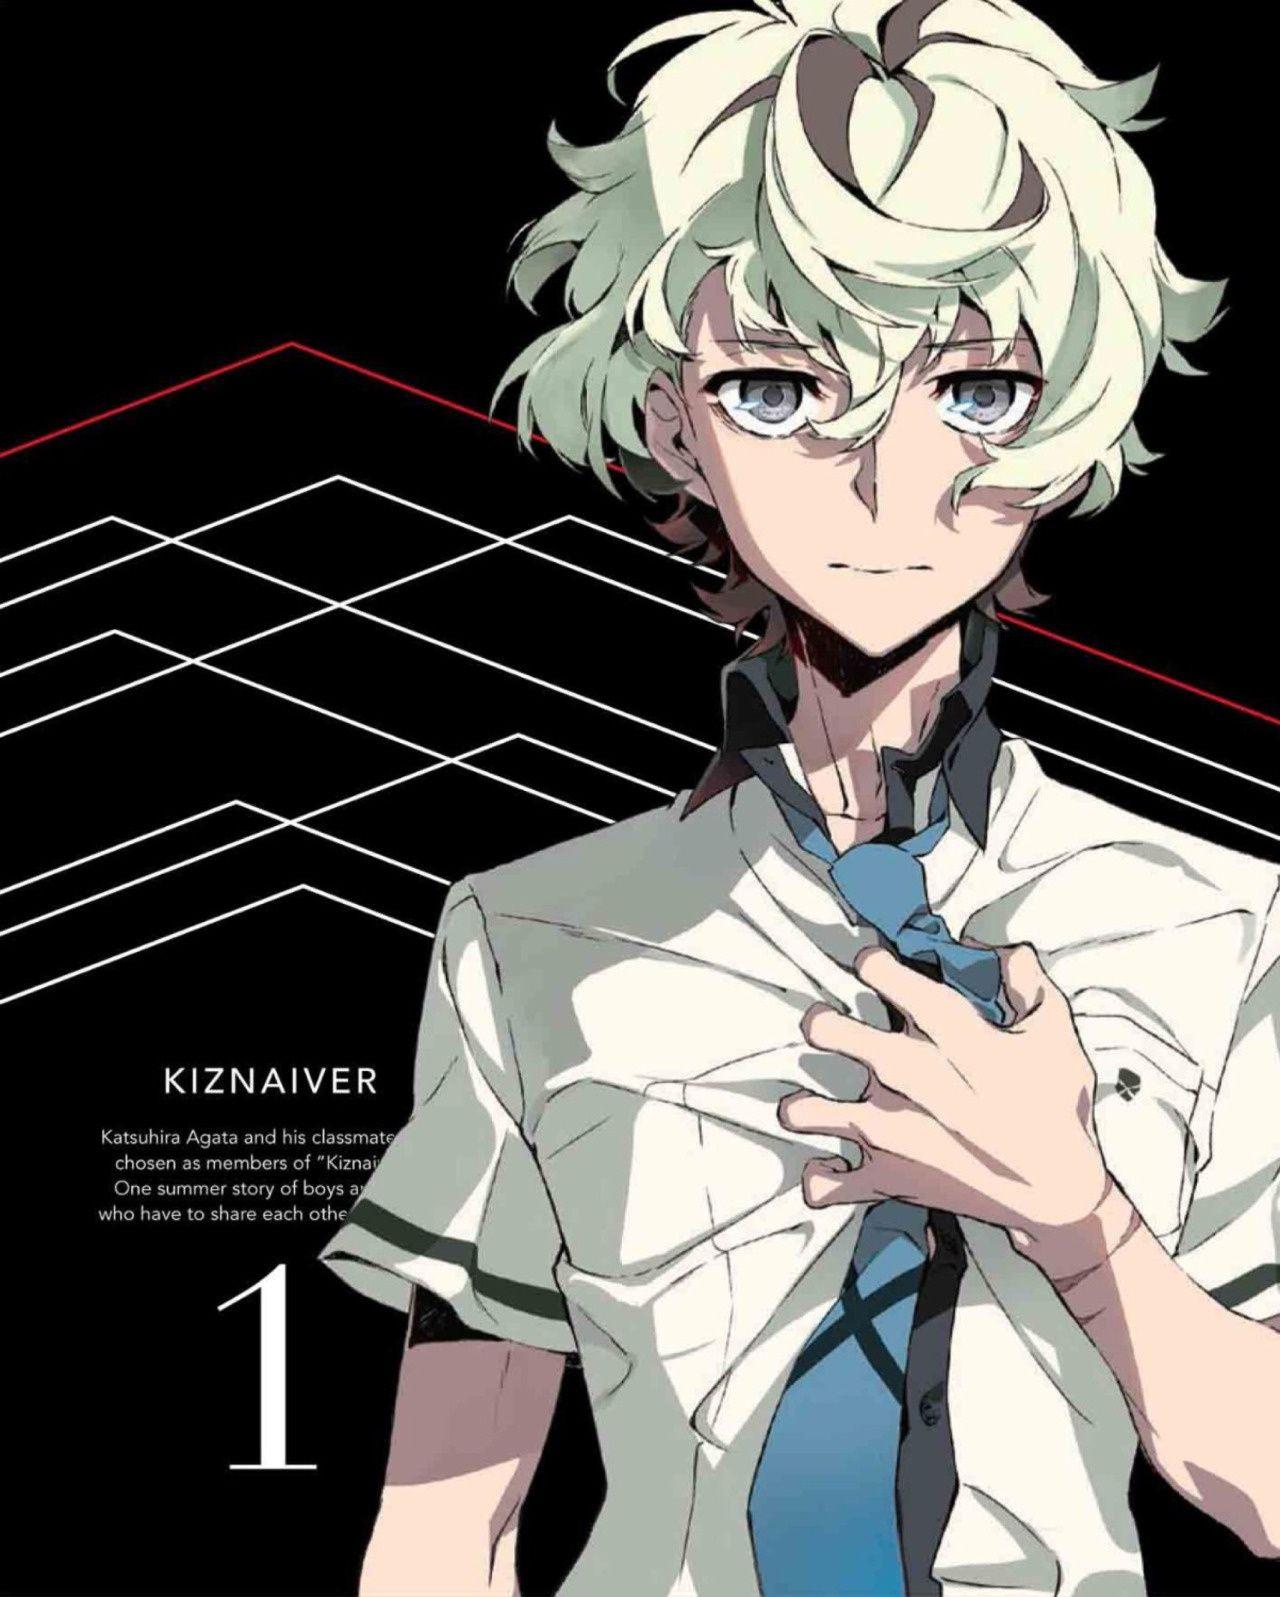 Kiznaiver My Anime Shelf Kiznaiver / Кизнайвер Аниме